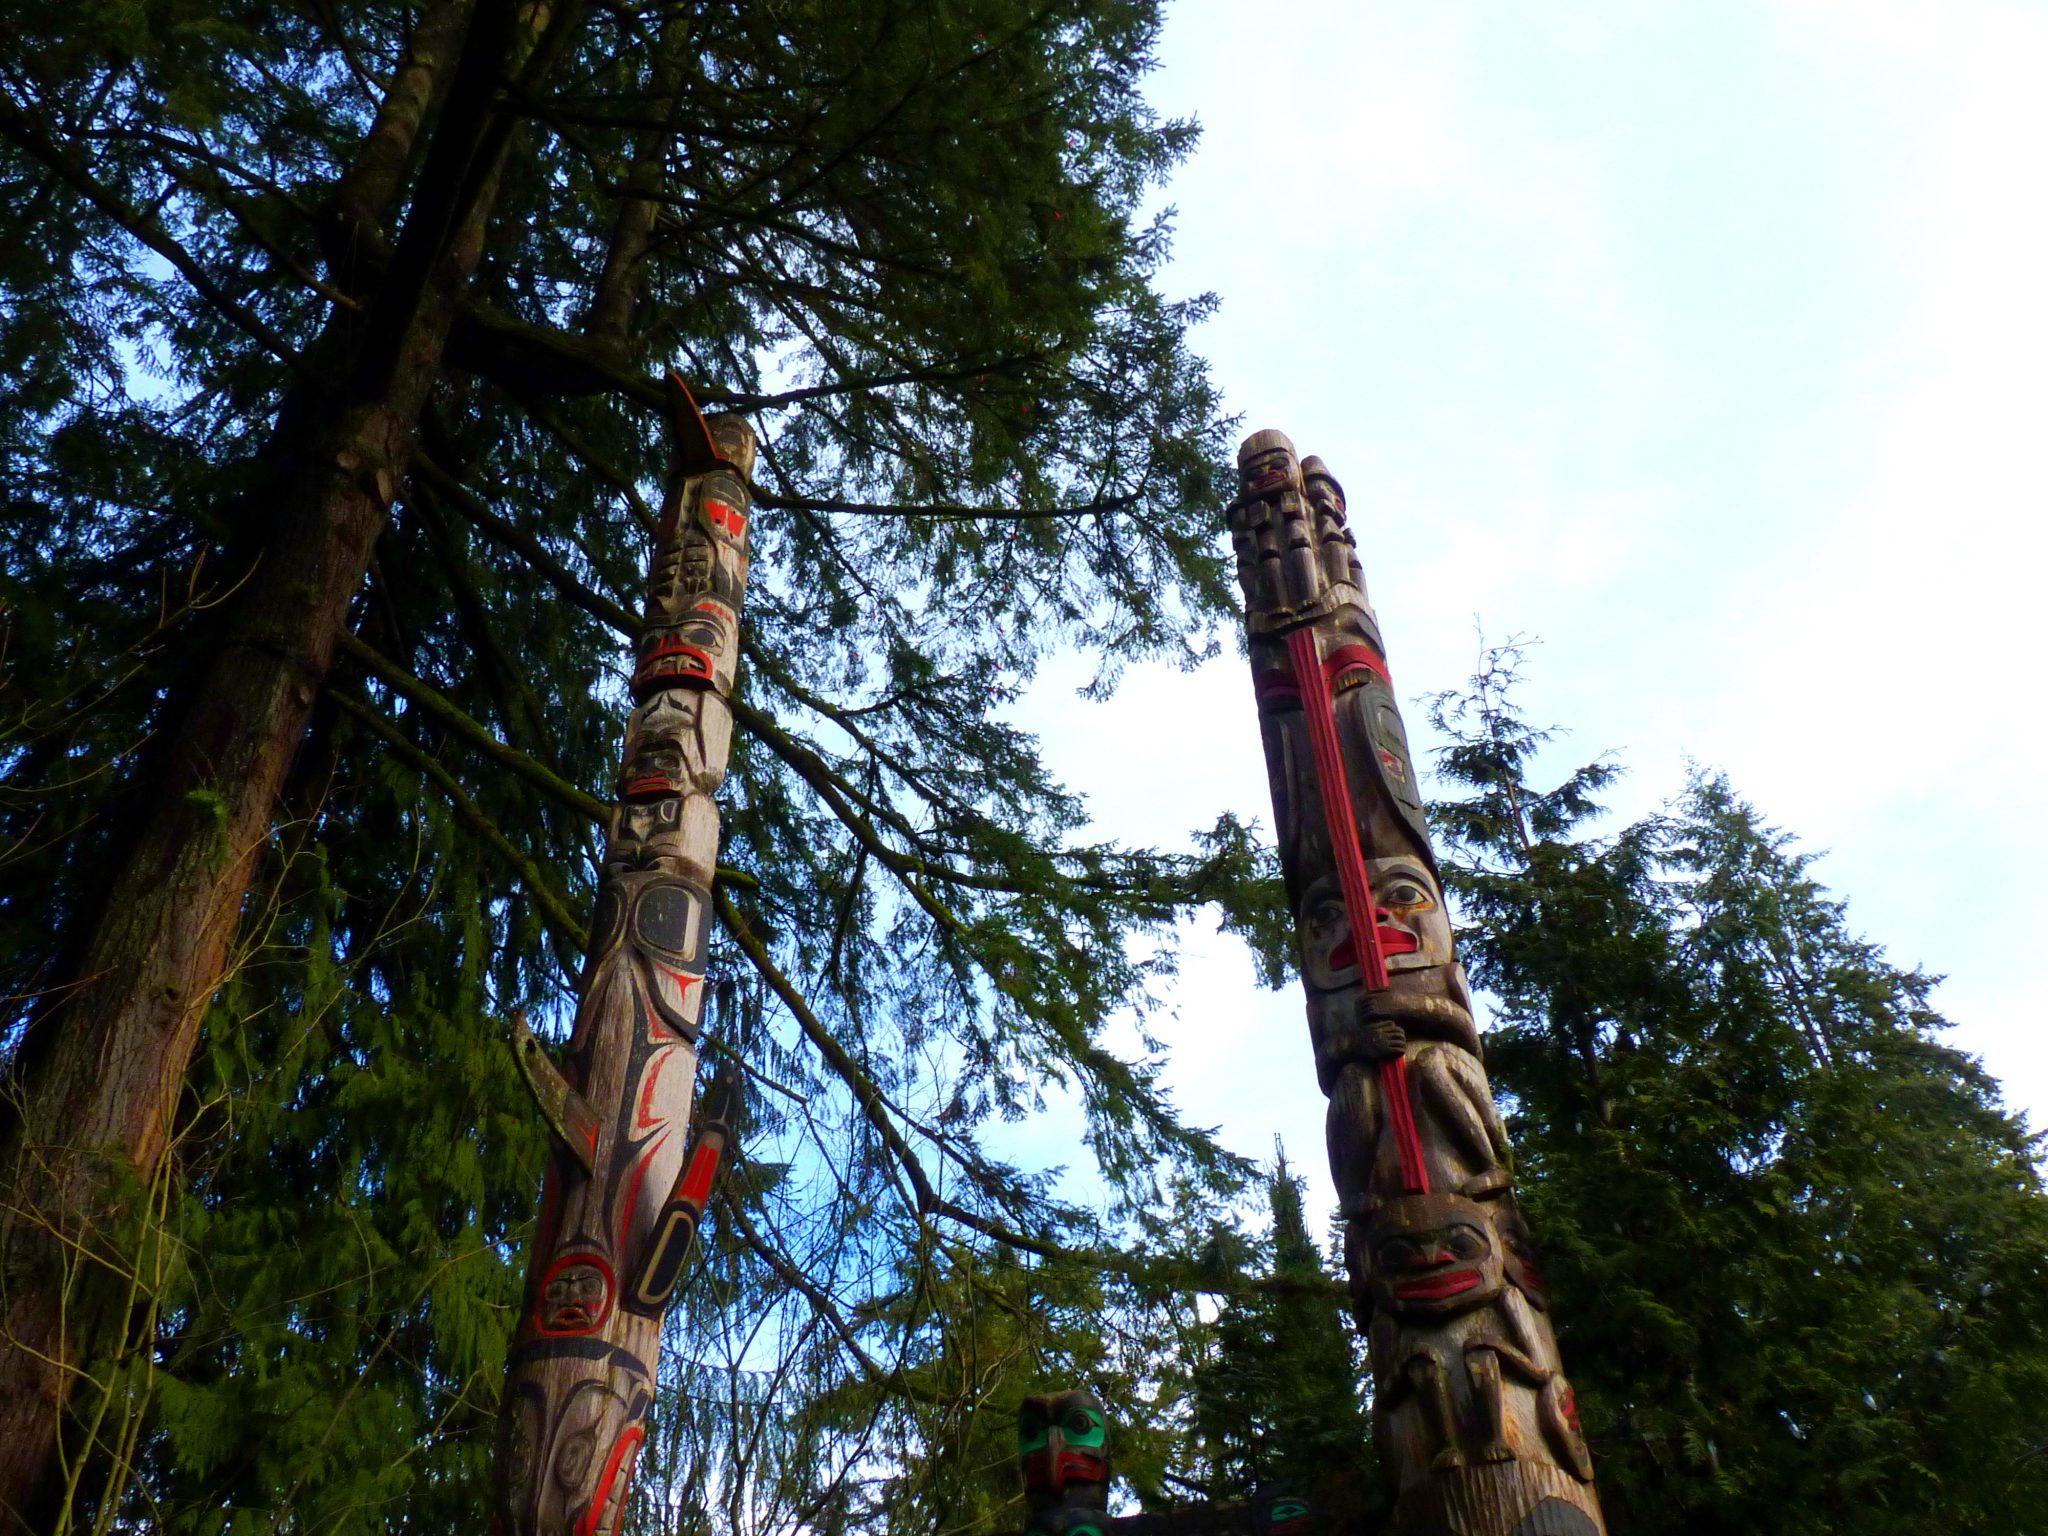 Totem 04 Capilano Suspension Bridge Park Vancouver Canadá Mundo Indefinido